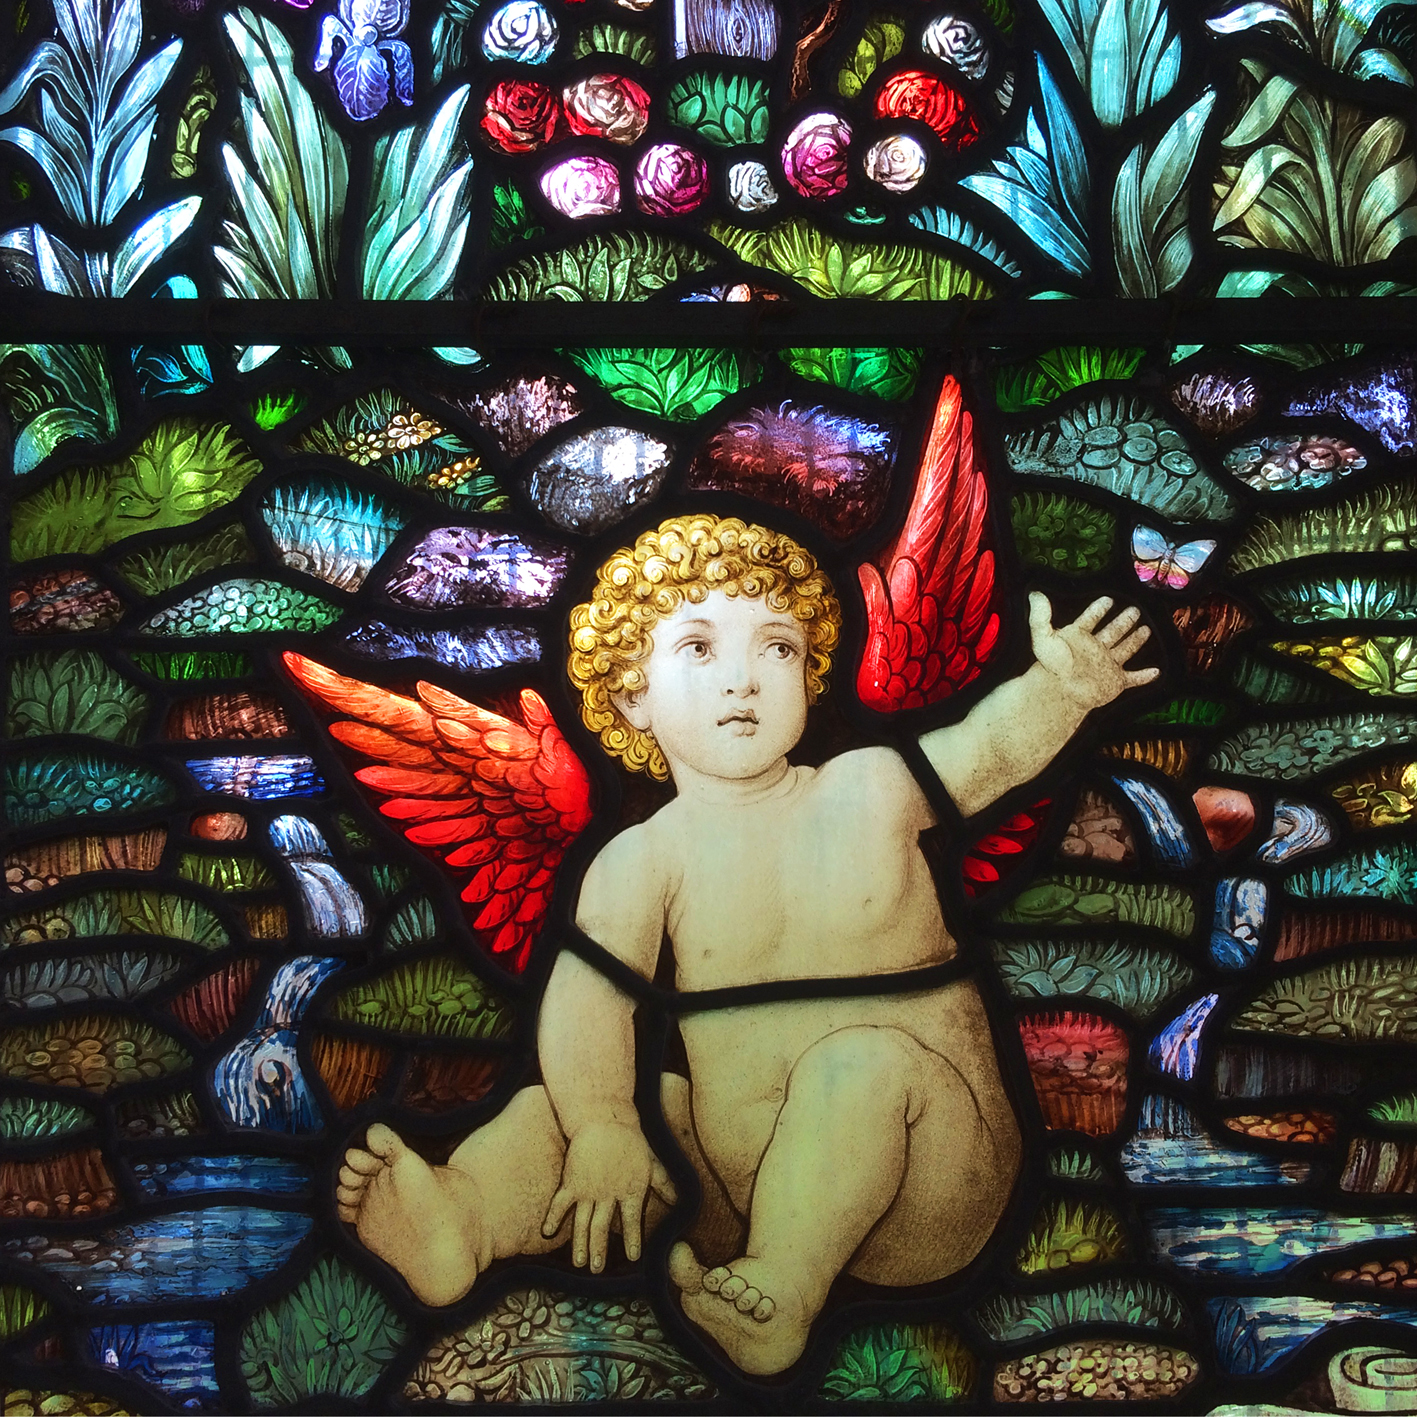 Detail of 1919 window designed by Edward Prynne, made by J.Jennings.